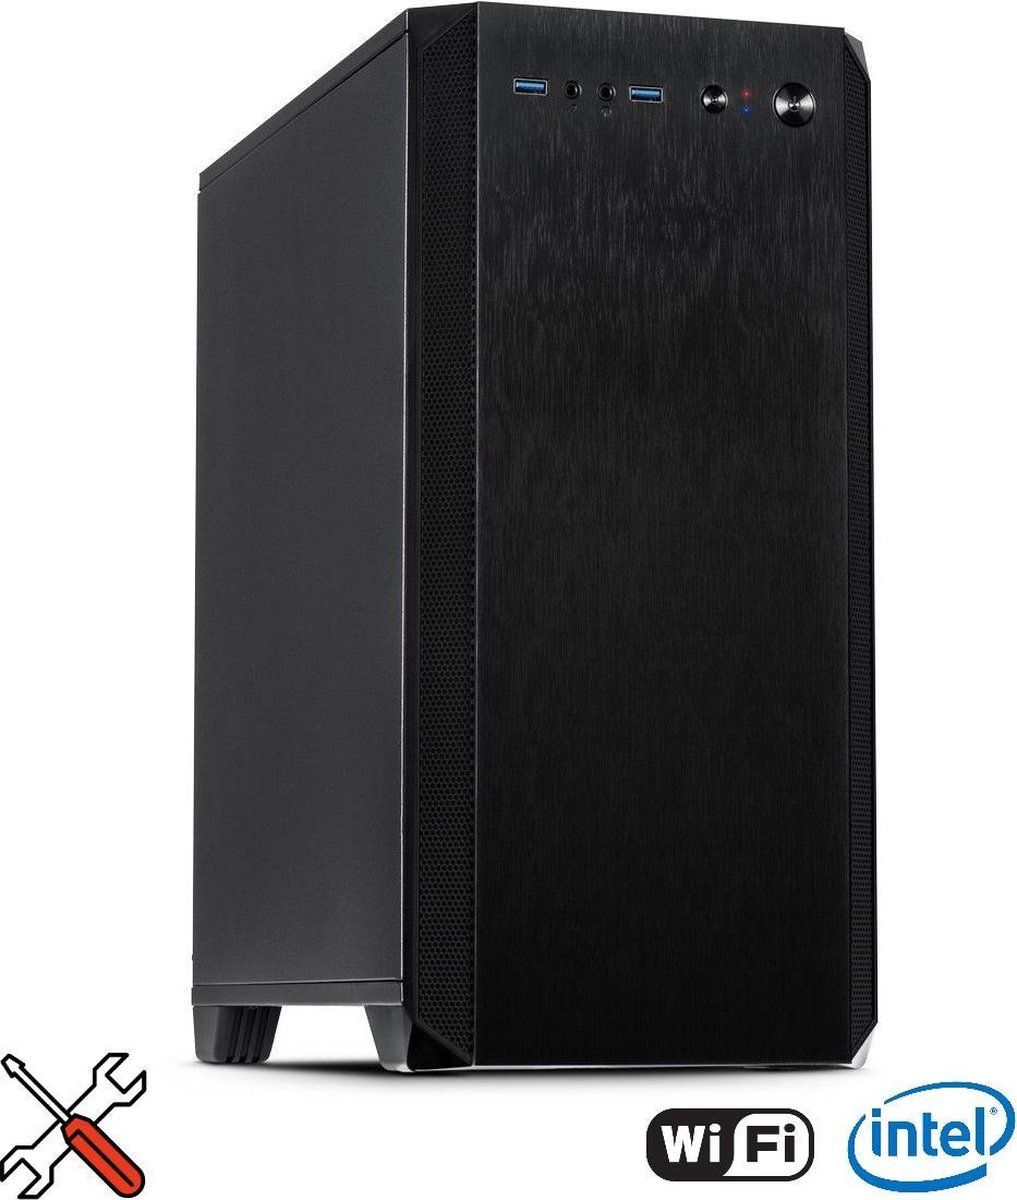 Home/Office PC – 480GB SSD + 2 TB HDD – Intel® Core™ i5 – 16 GB RAM – Zakelijke PC –  Windows Wifi PC +